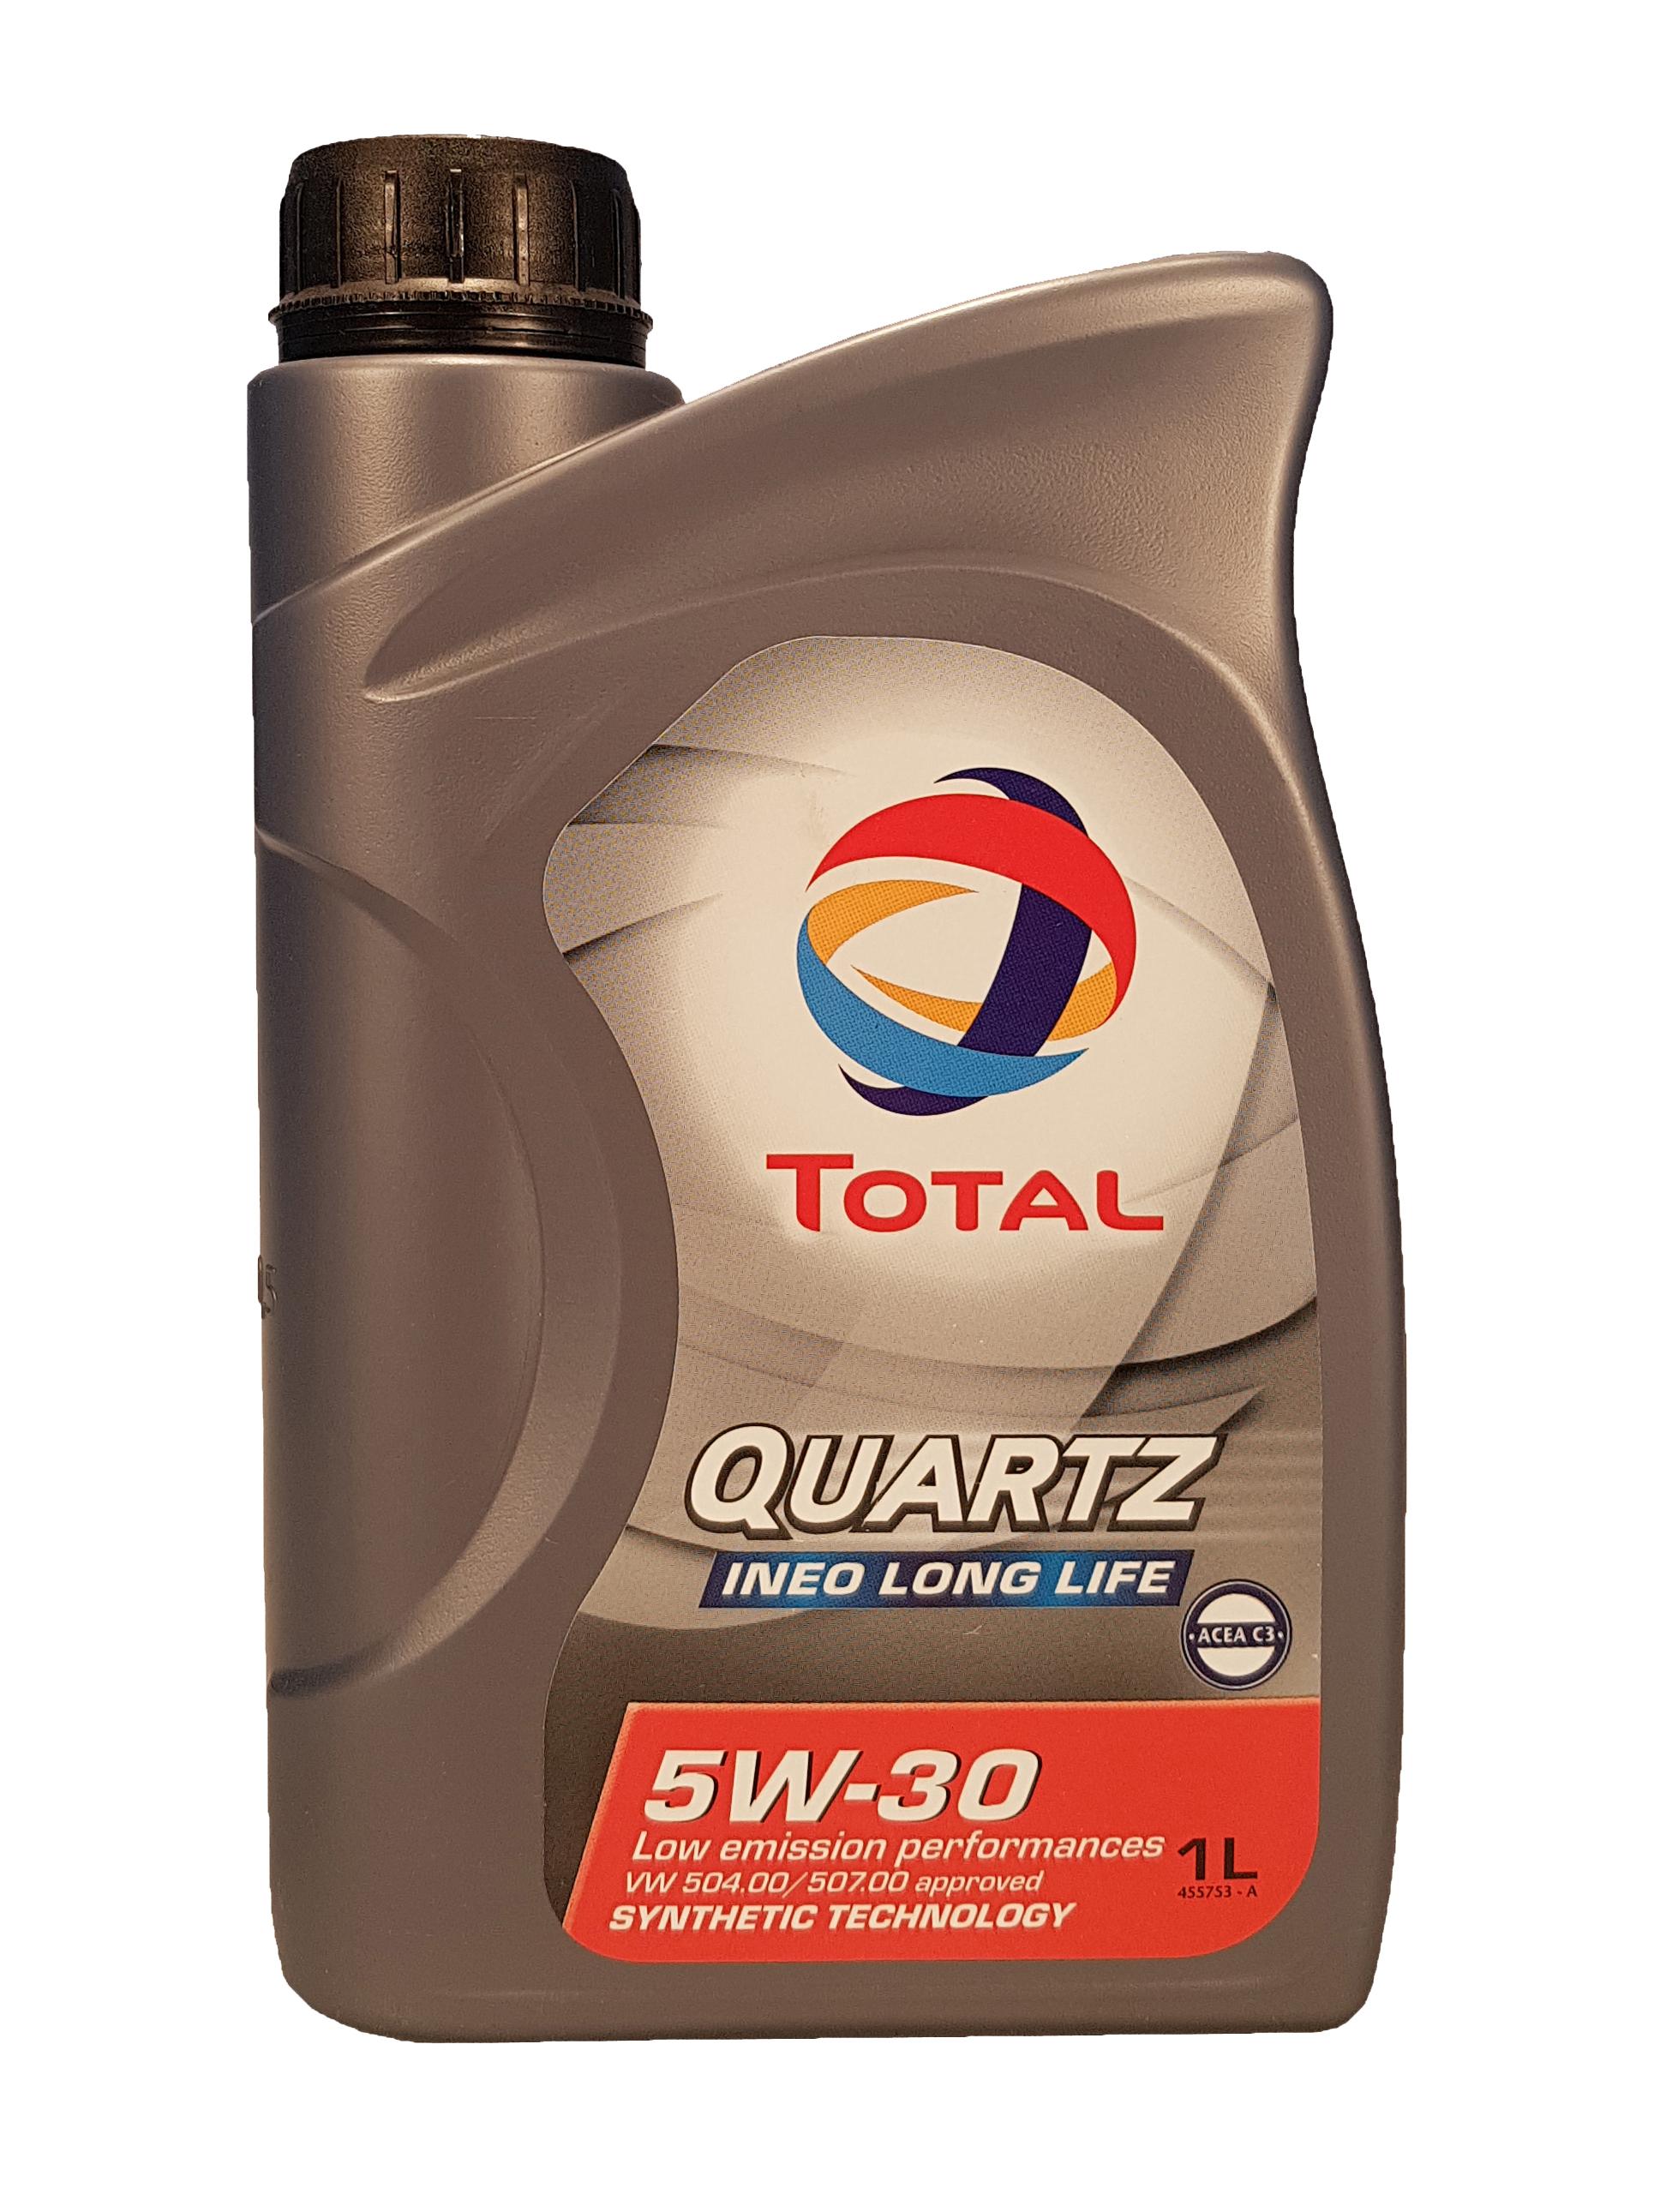 Total Quartz Ineo Longlife 5W-30 1 Liter – Bild 1